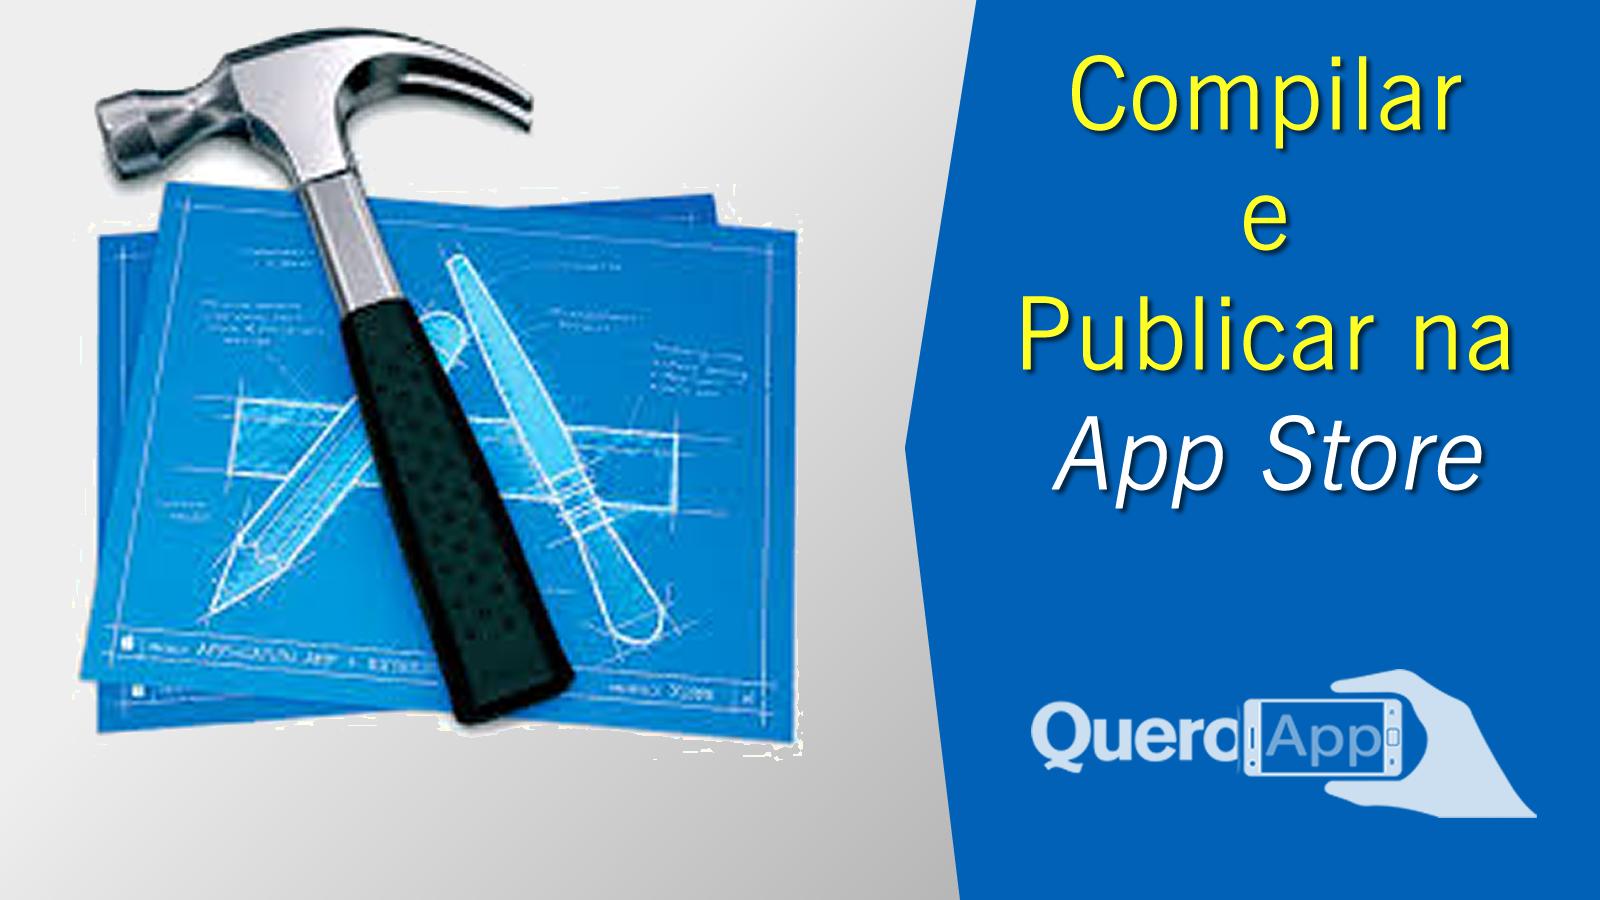 Como compilar aplicativos para iOS?